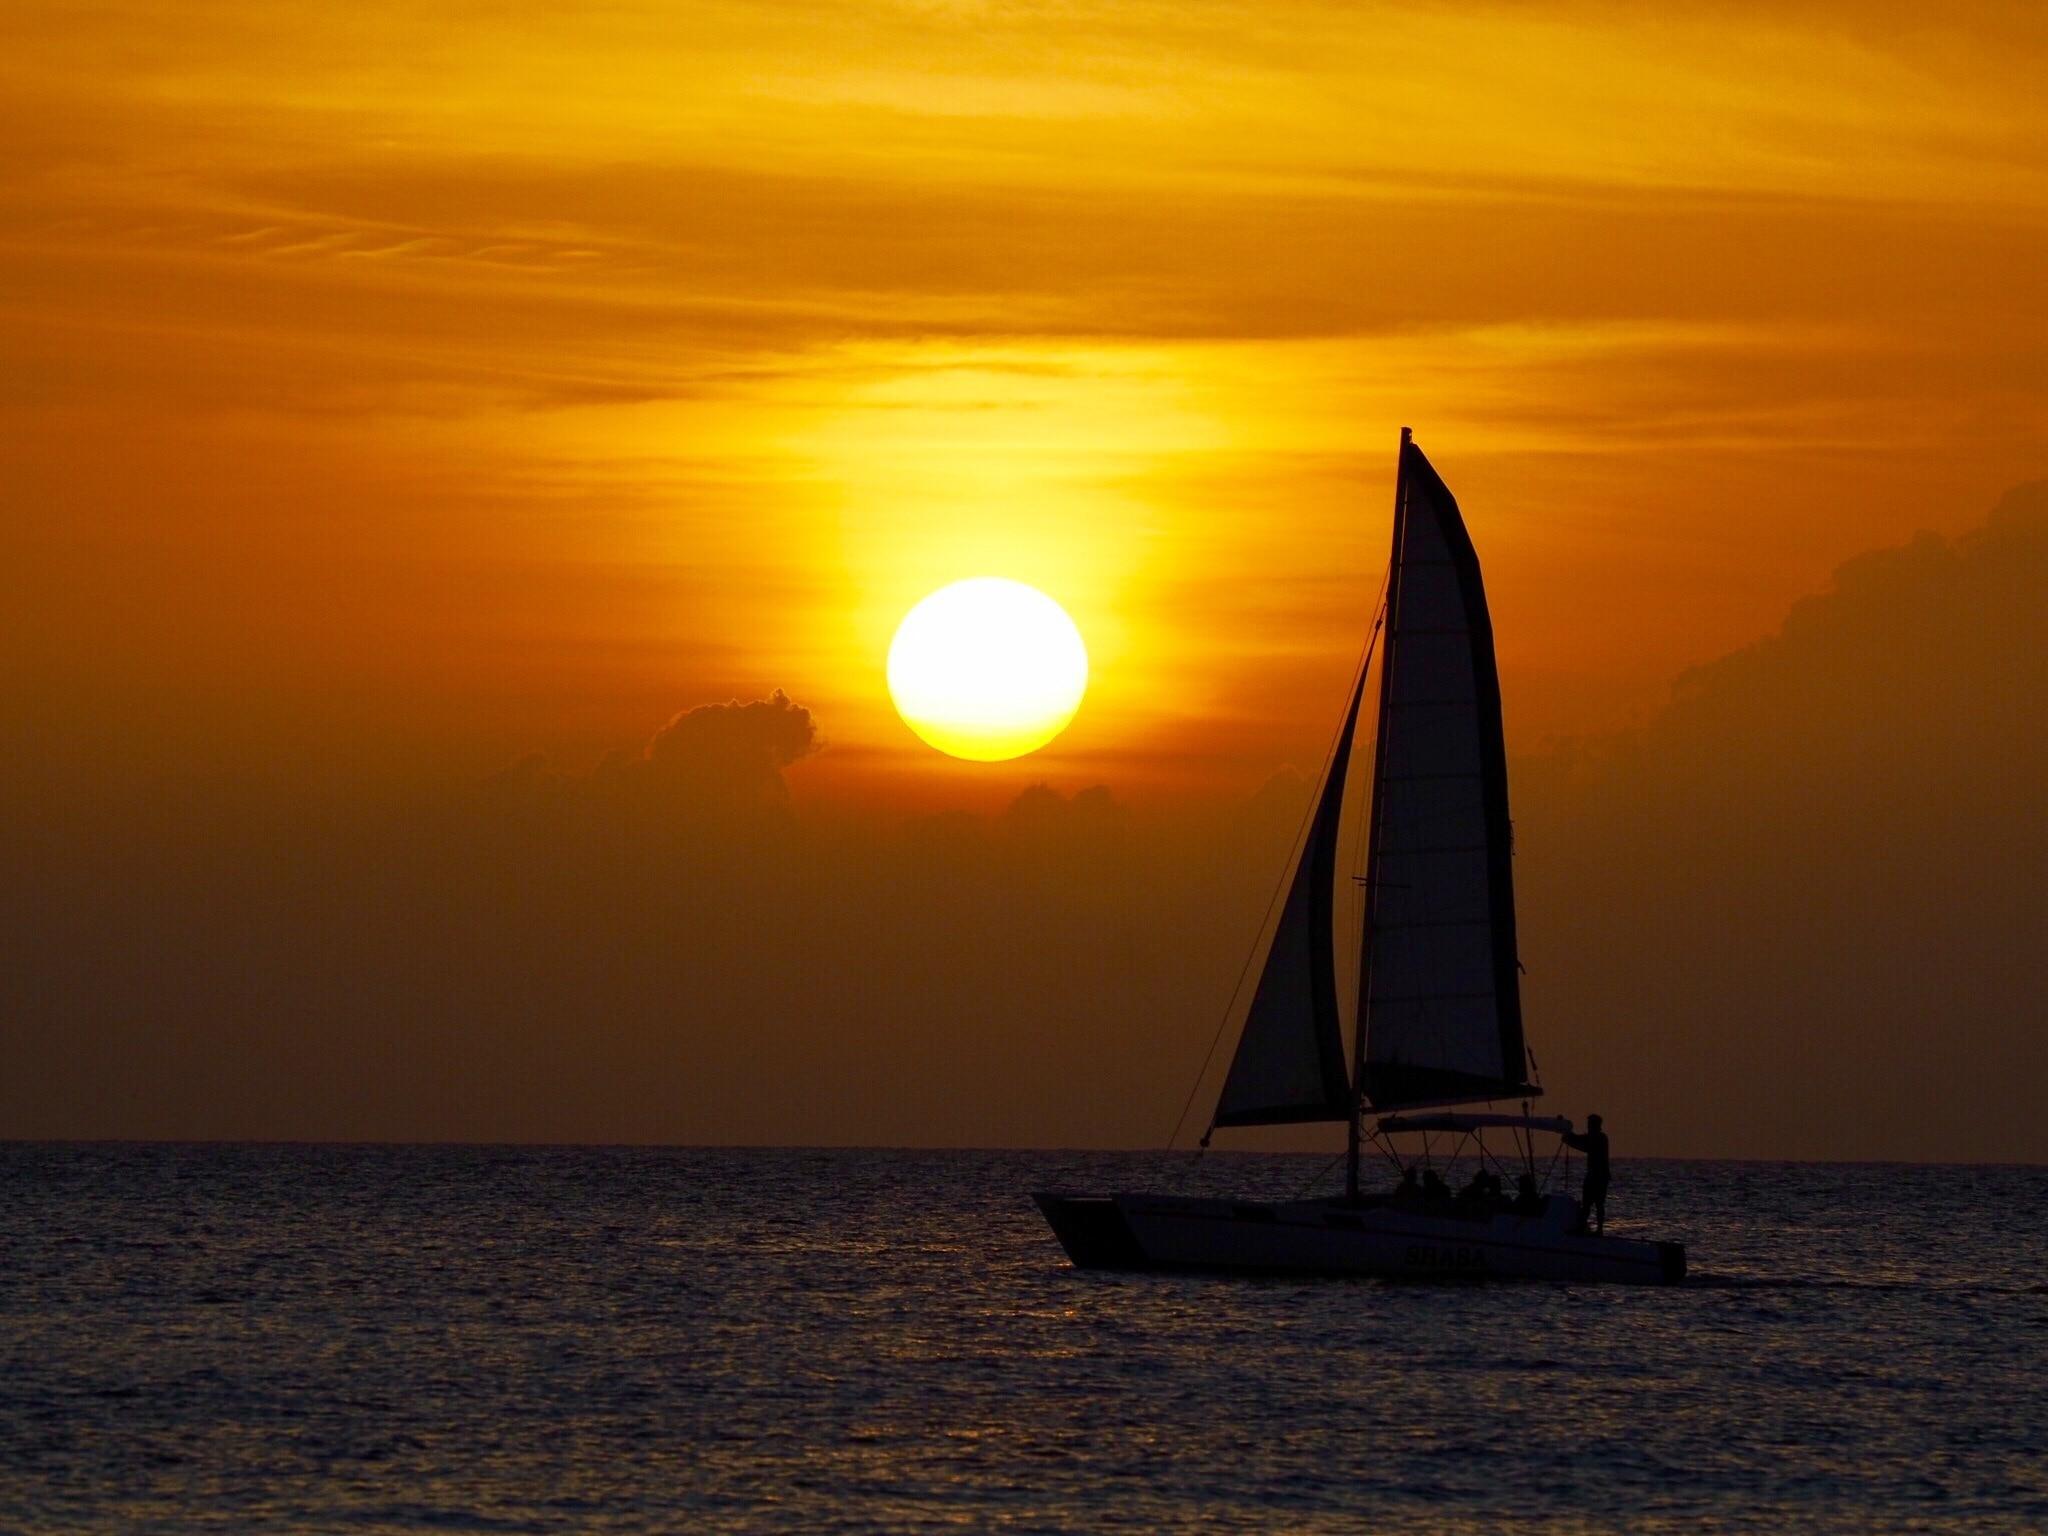 Porters, Holetown, St. James, Barbados